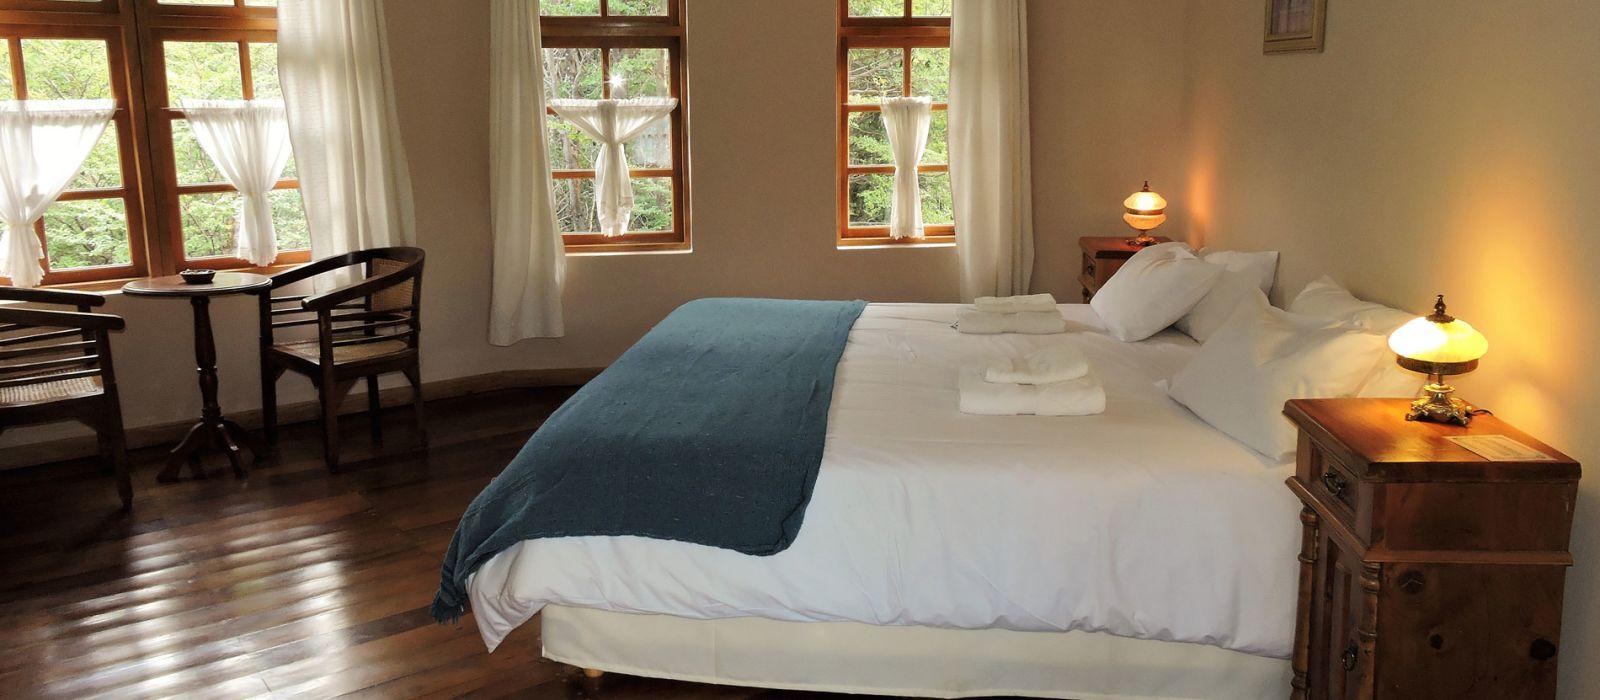 Hotel Hosteria El Pilar Argentina